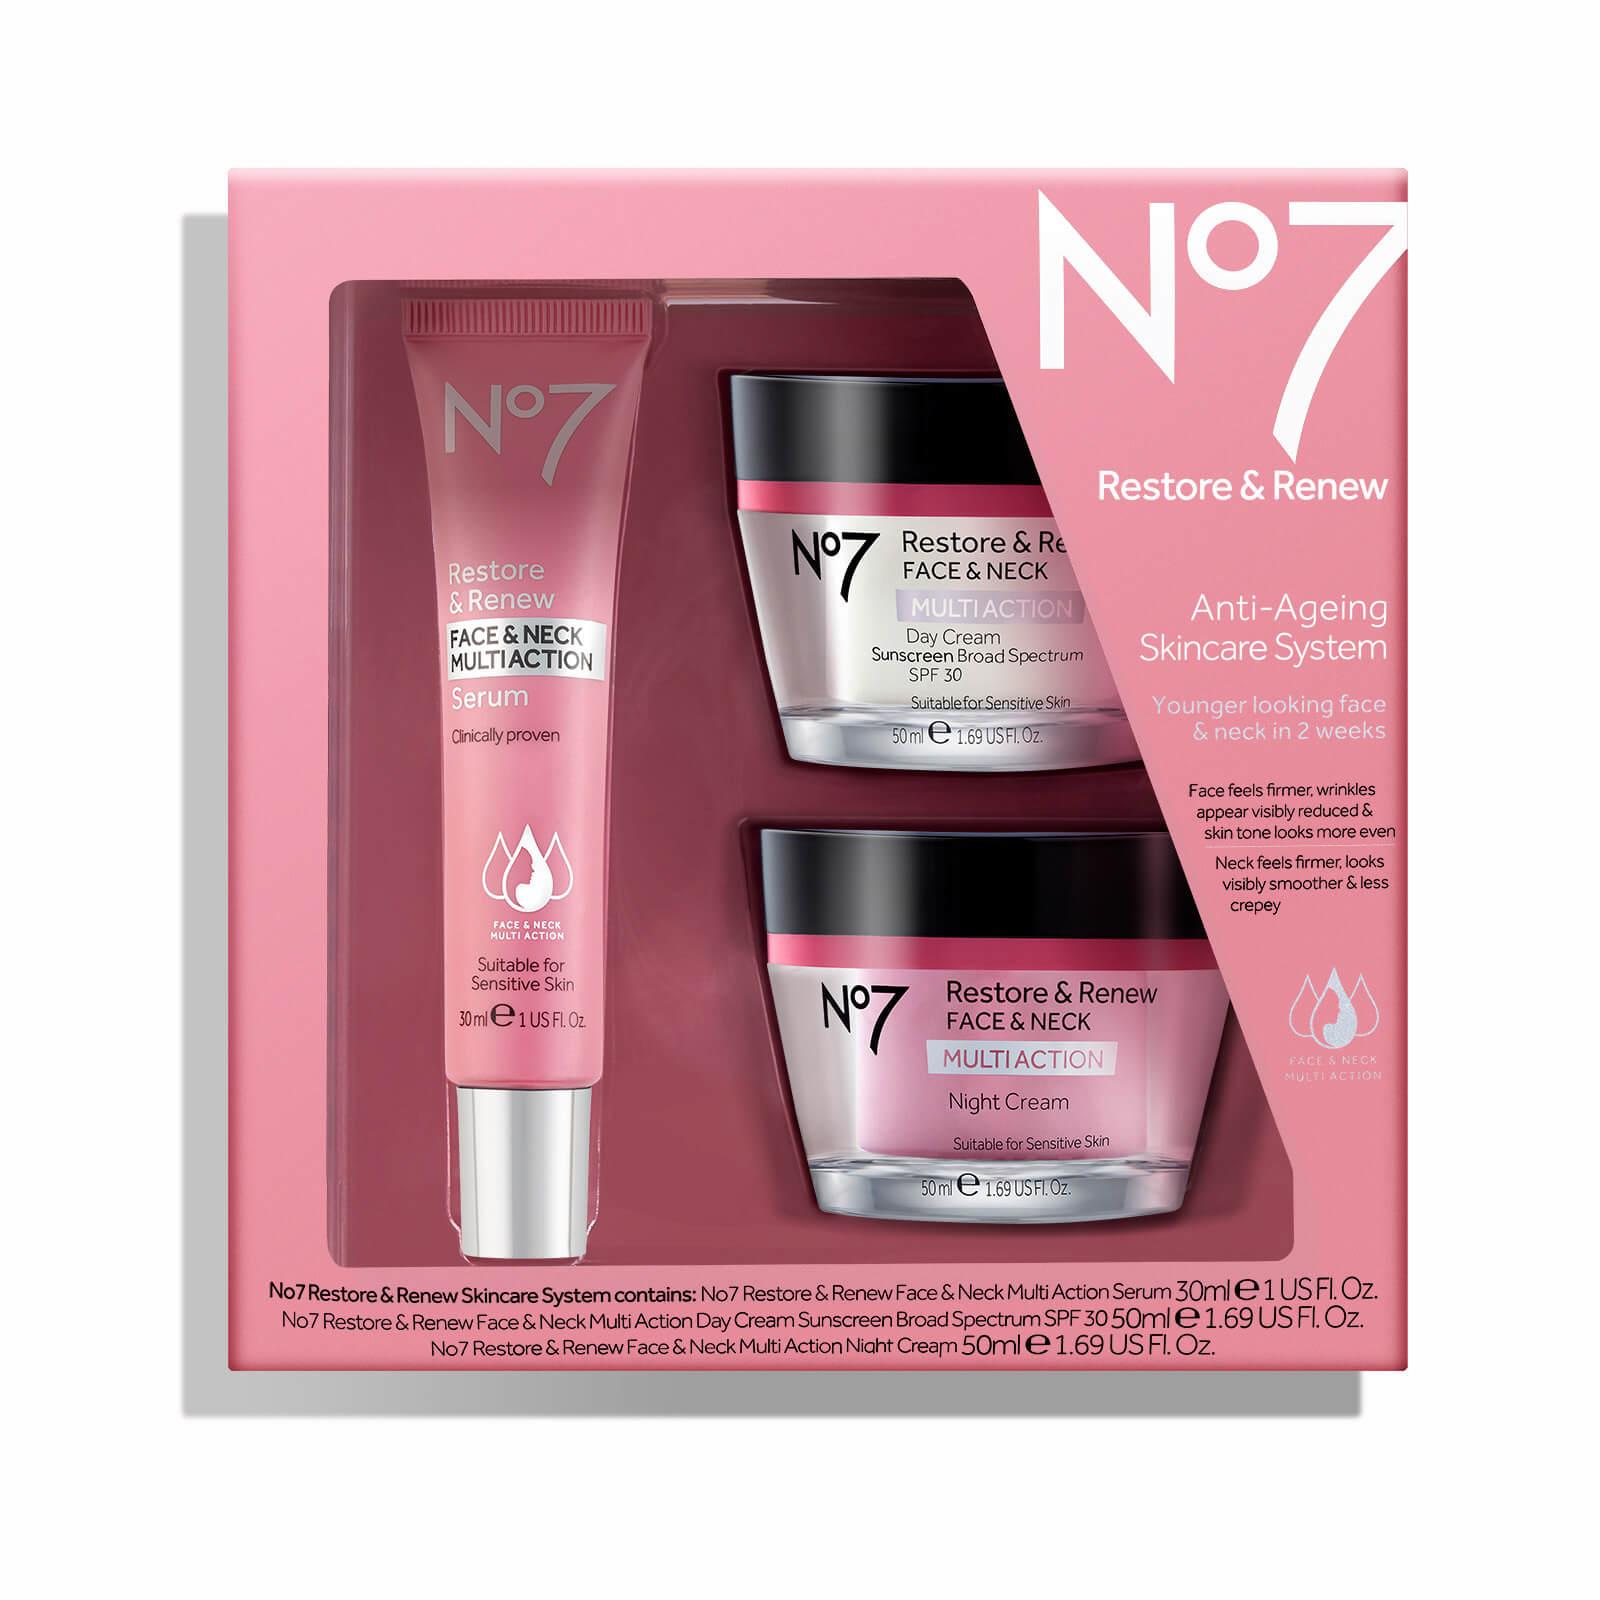 No7 Restore & Renew Face & Neck Multi Skincare System Kit